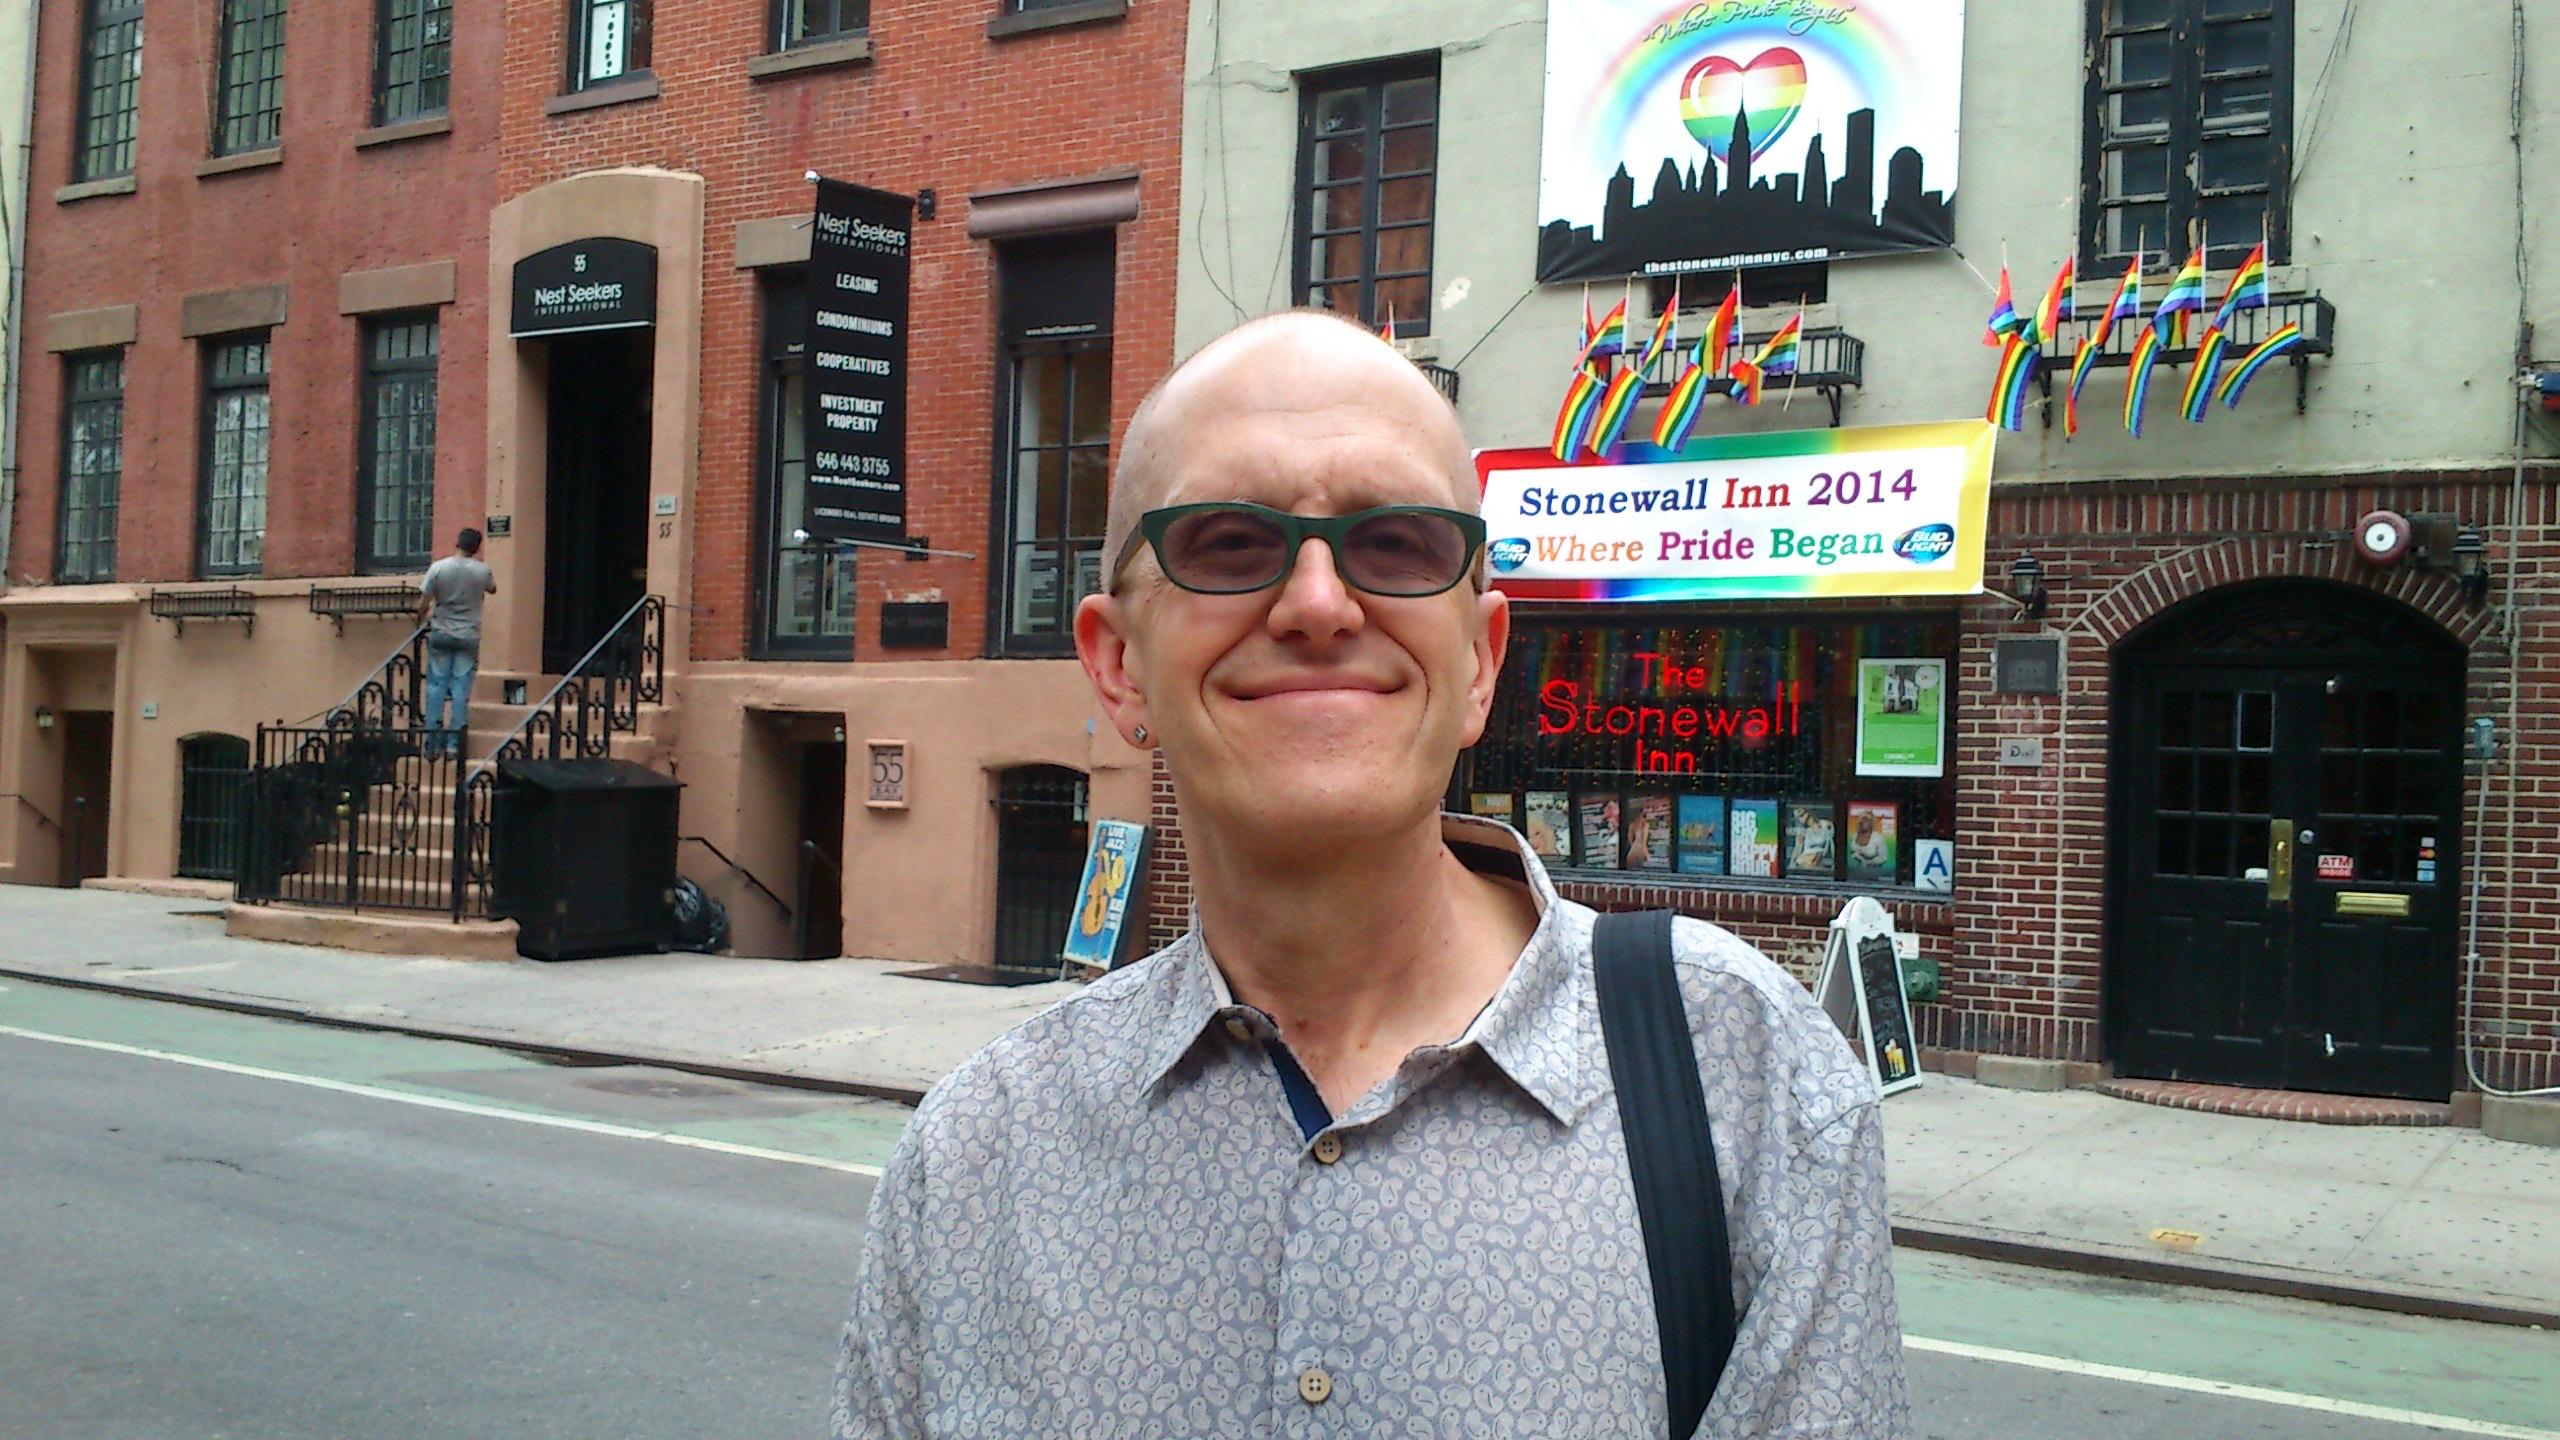 Professor Ian Barnard in front of the Stonewall Inn